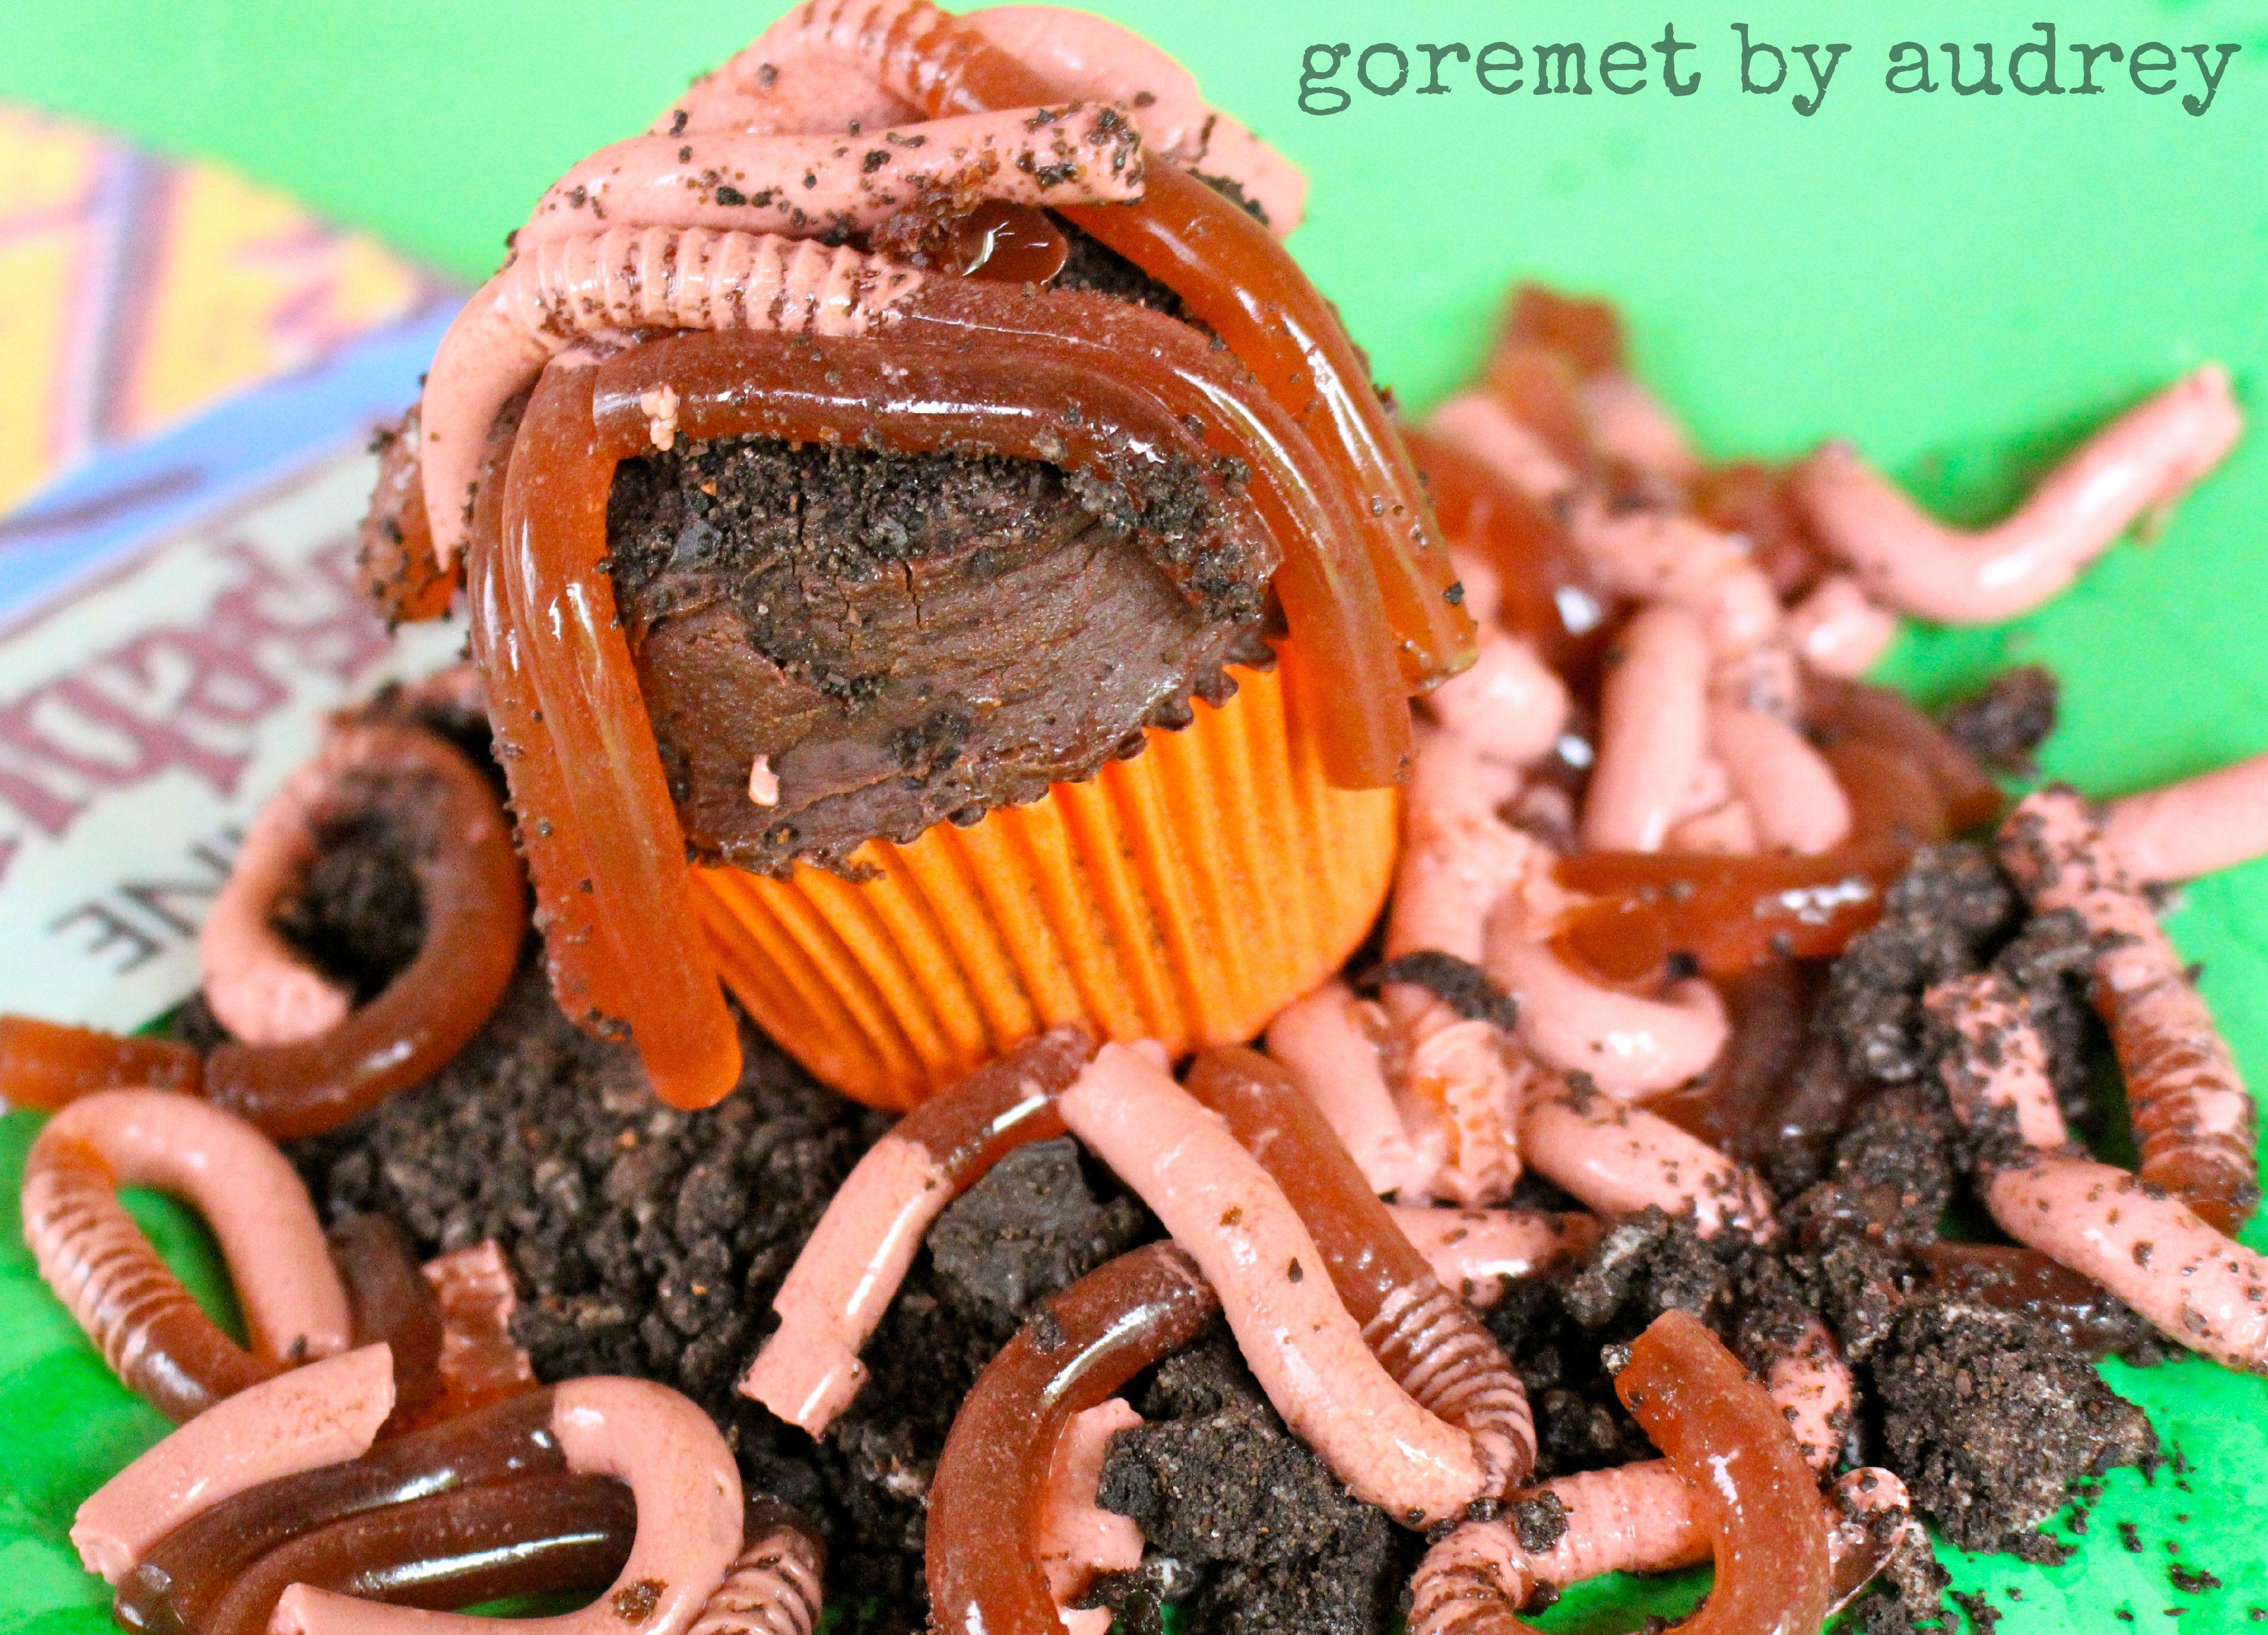 halloween cupcakes goosebumps inspired go eat worms - Halloween Inspired Cupcakes